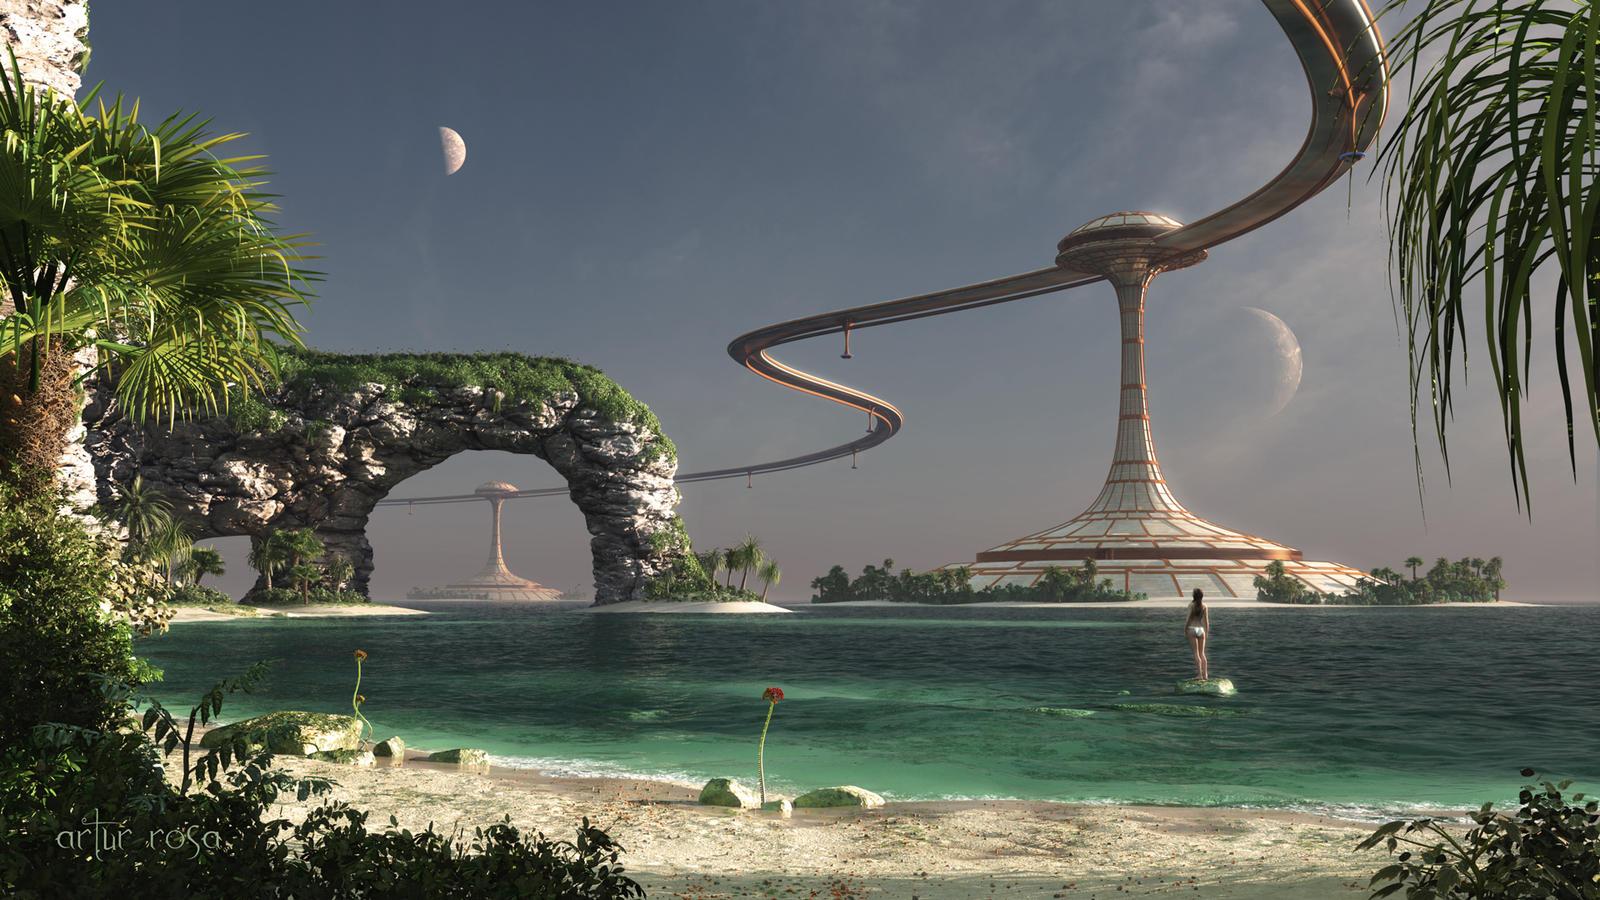 The Colony of Virgo by ArthurBlue